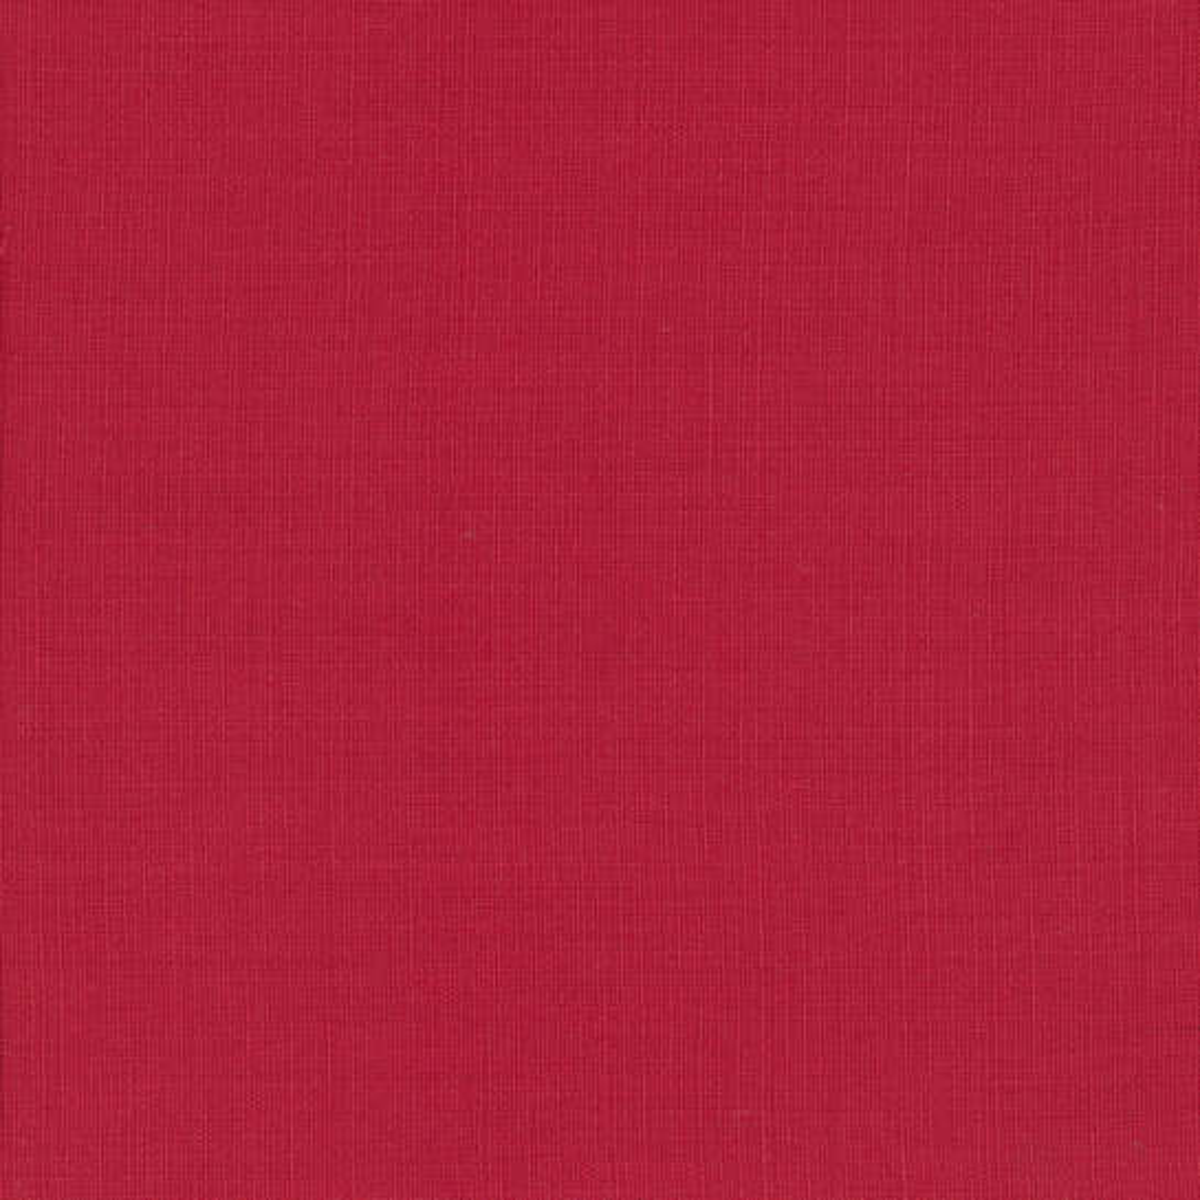 Estate Linen Red Fabric